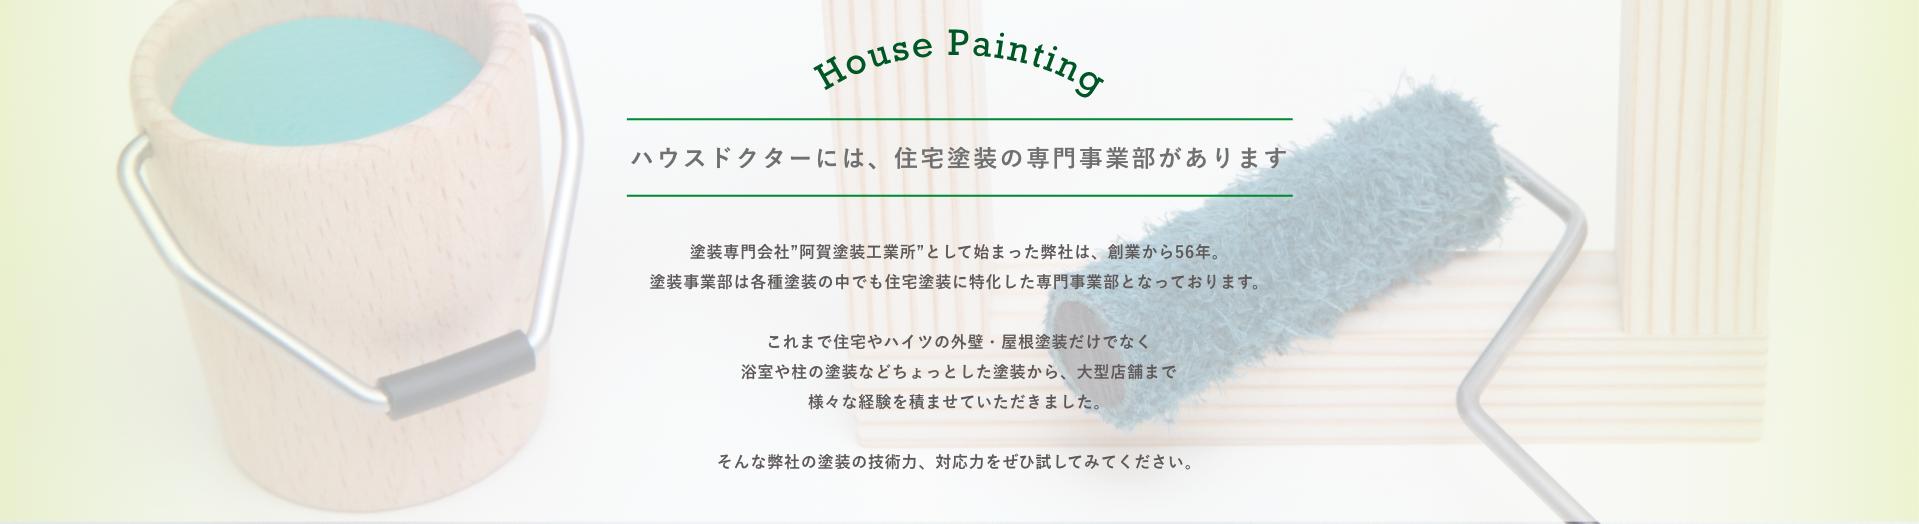 paomtomghouse-02